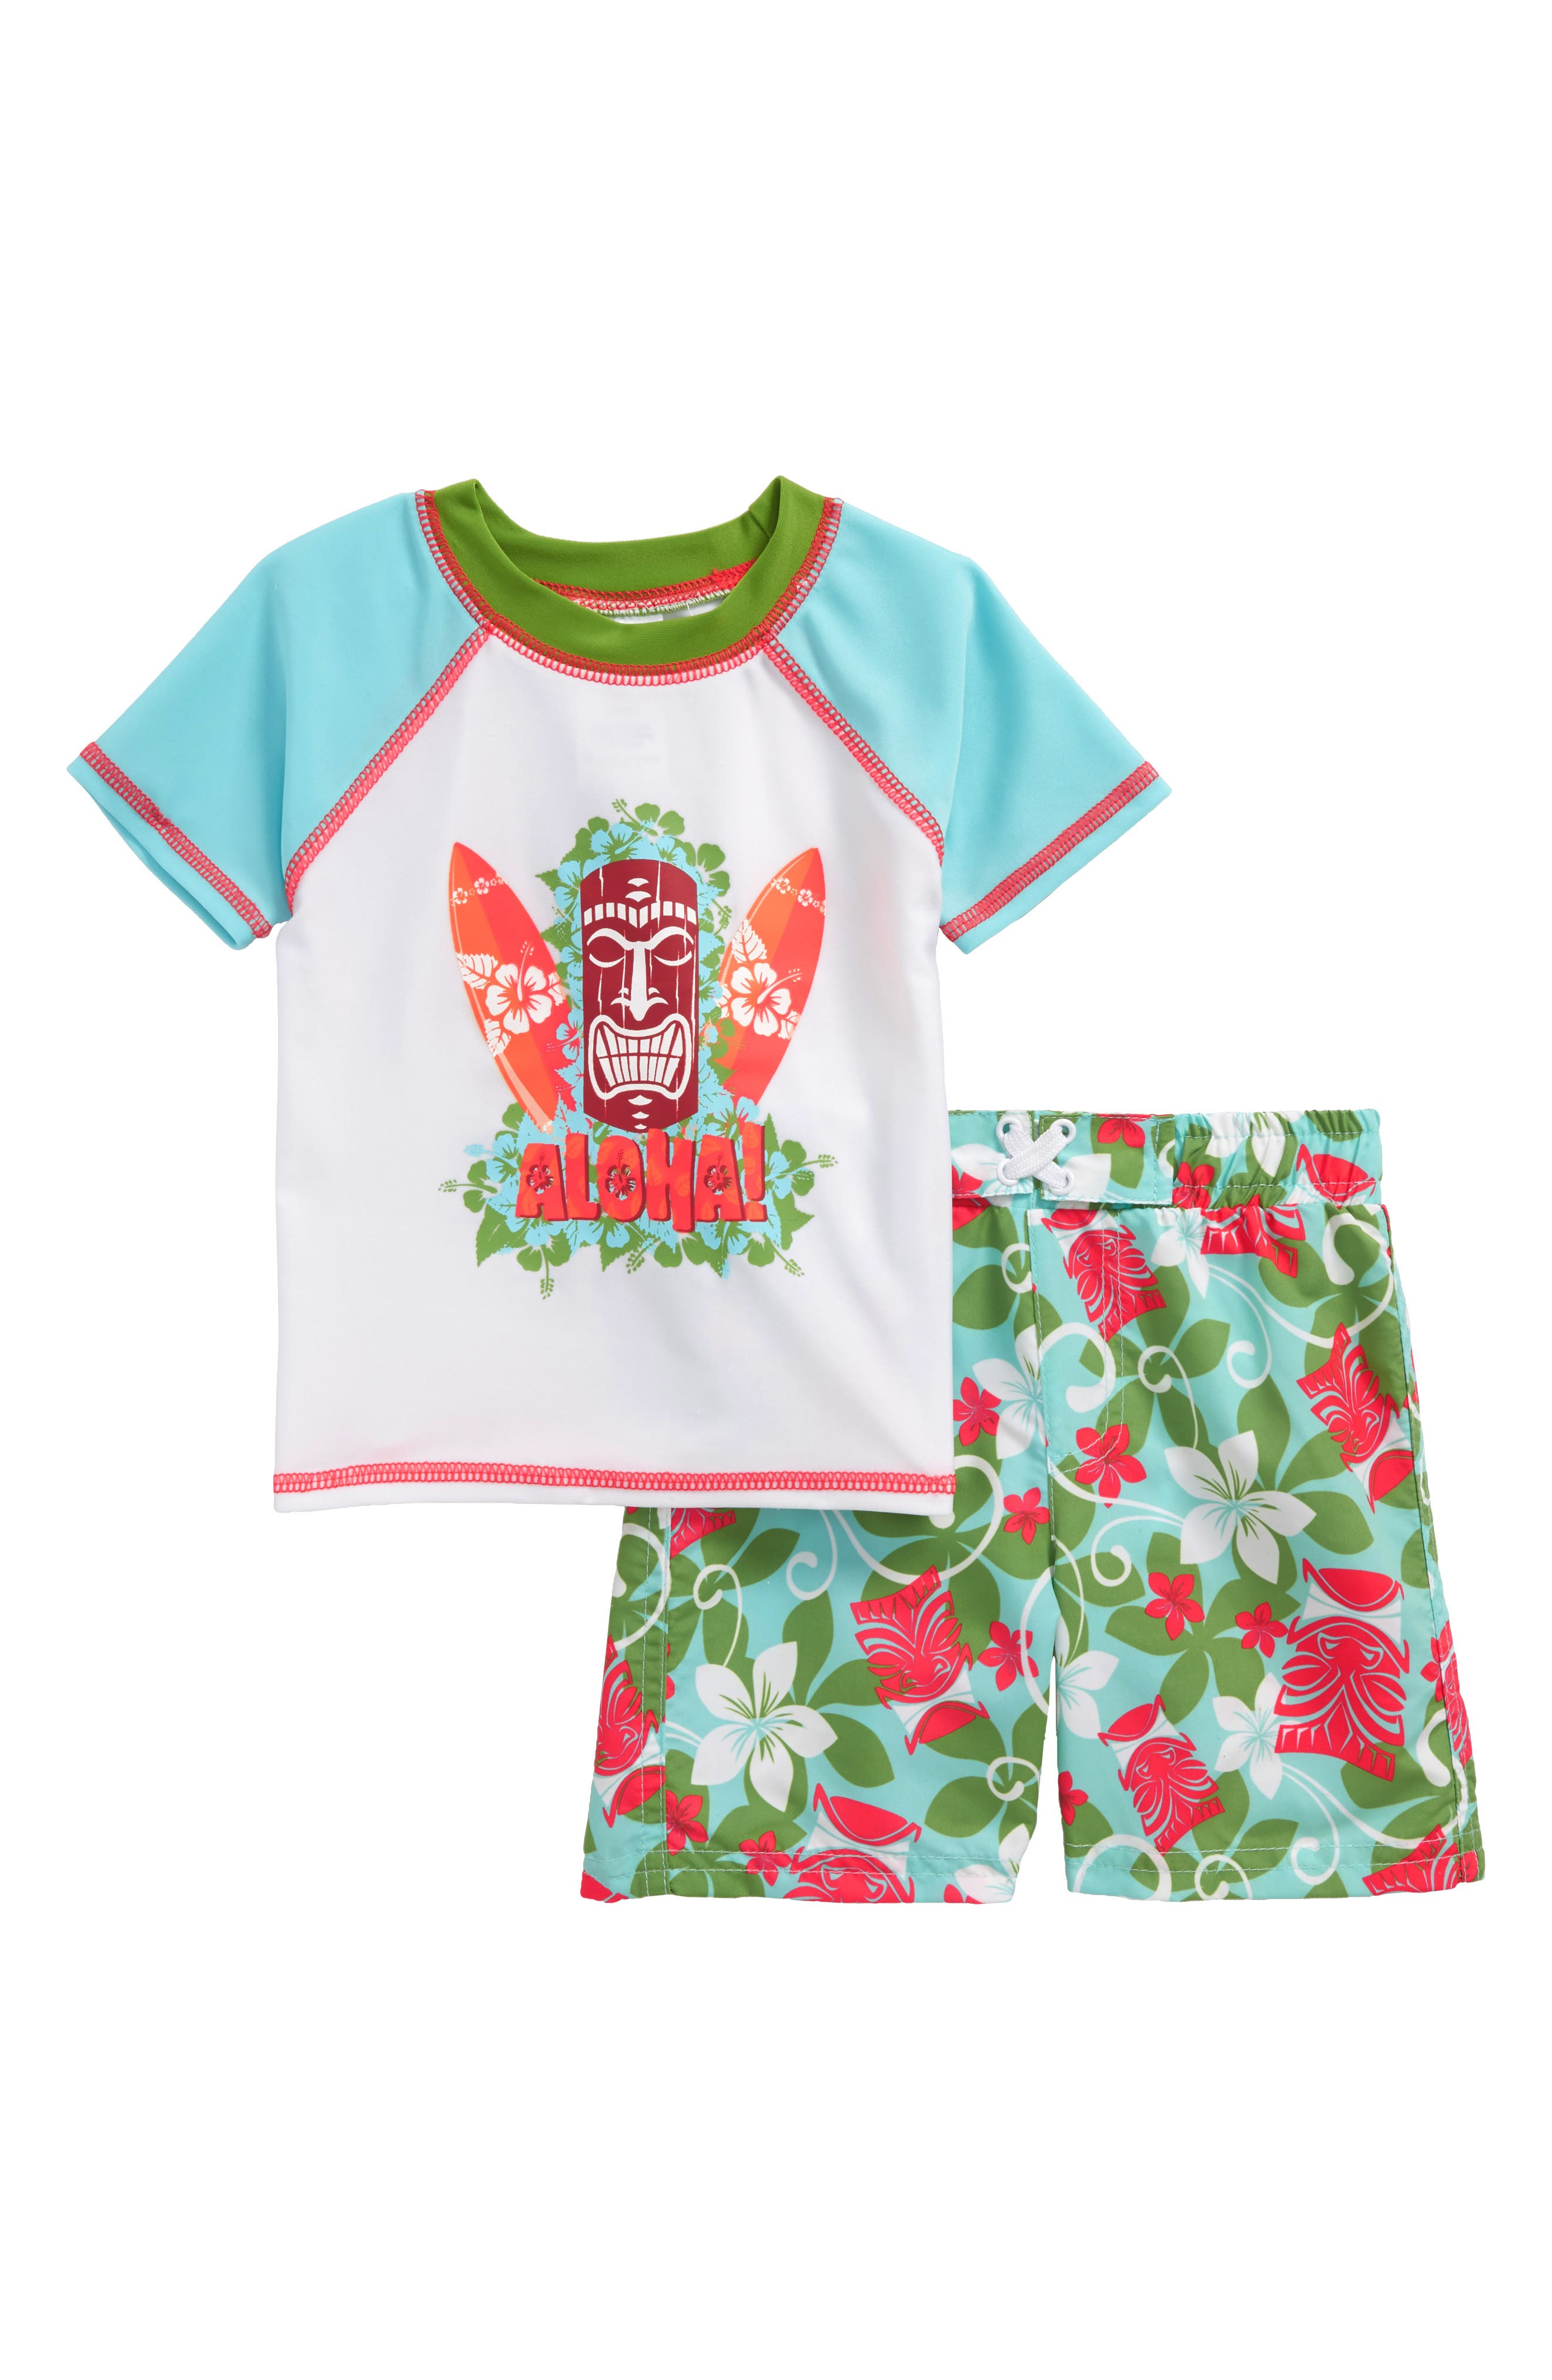 Aloha Tiki Two-Piece Rashguard Swimsuit,                             Main thumbnail 1, color,                             440